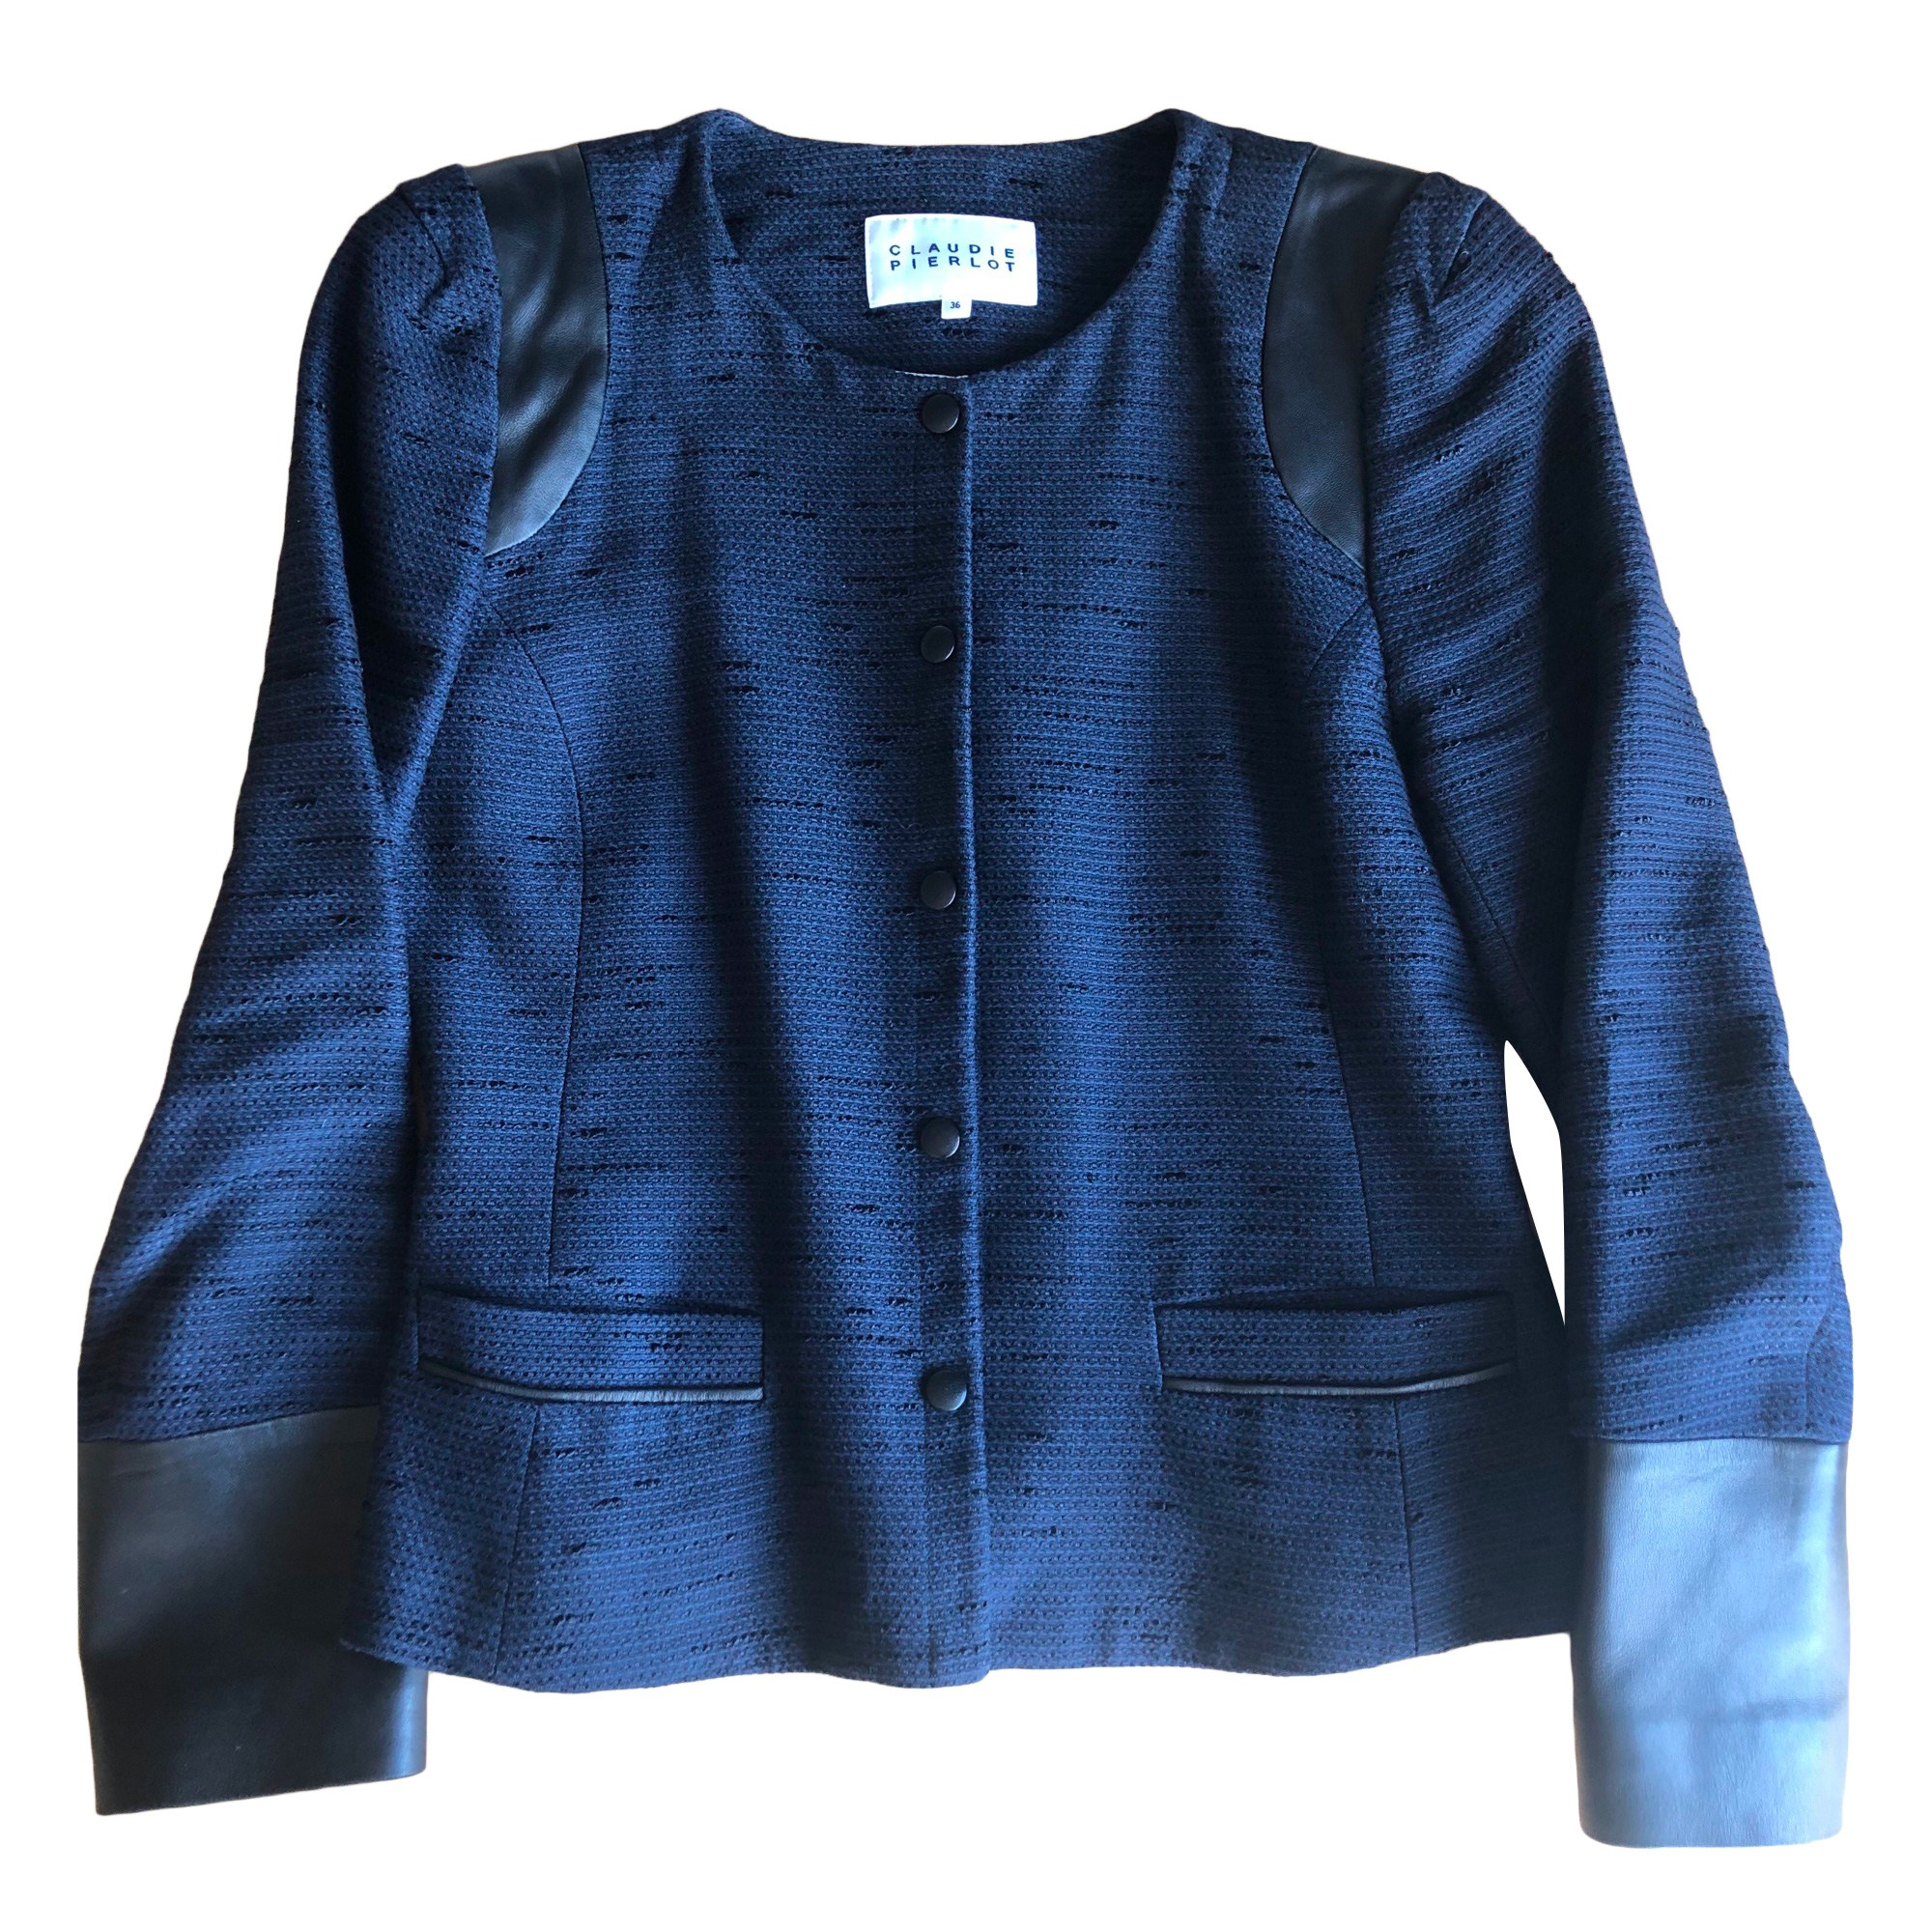 Jacket CLAUDIE PIERLOT Blue, navy, turquoise